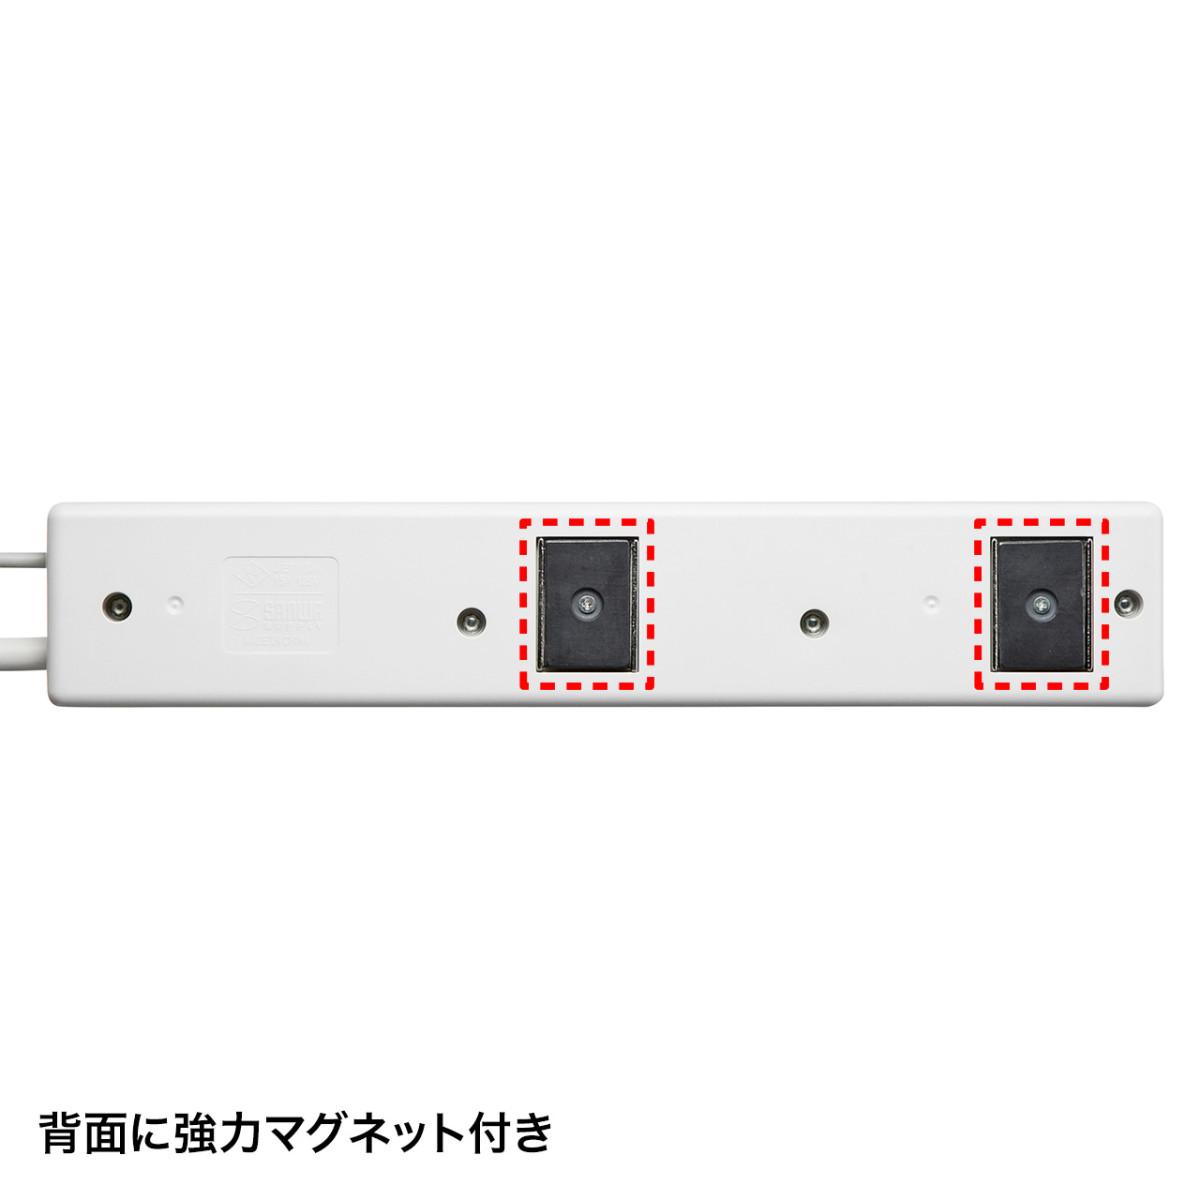 [TAP-RE34U-5] パソコン連動タップ(USB感知式・3P・4個口・5m)